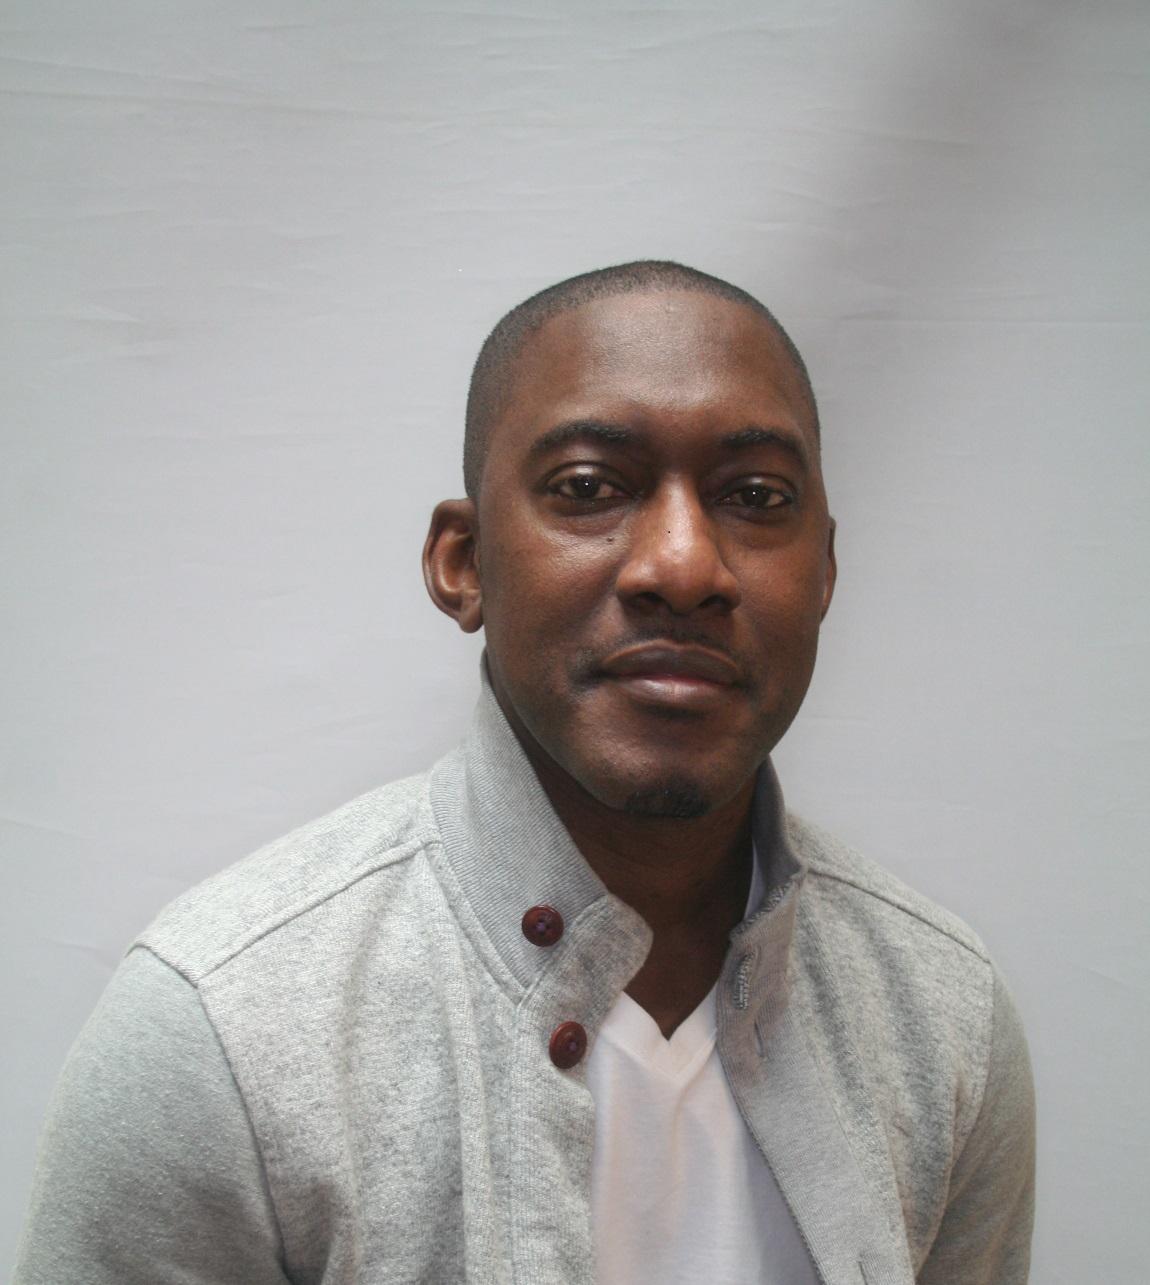 Kwame Opoku